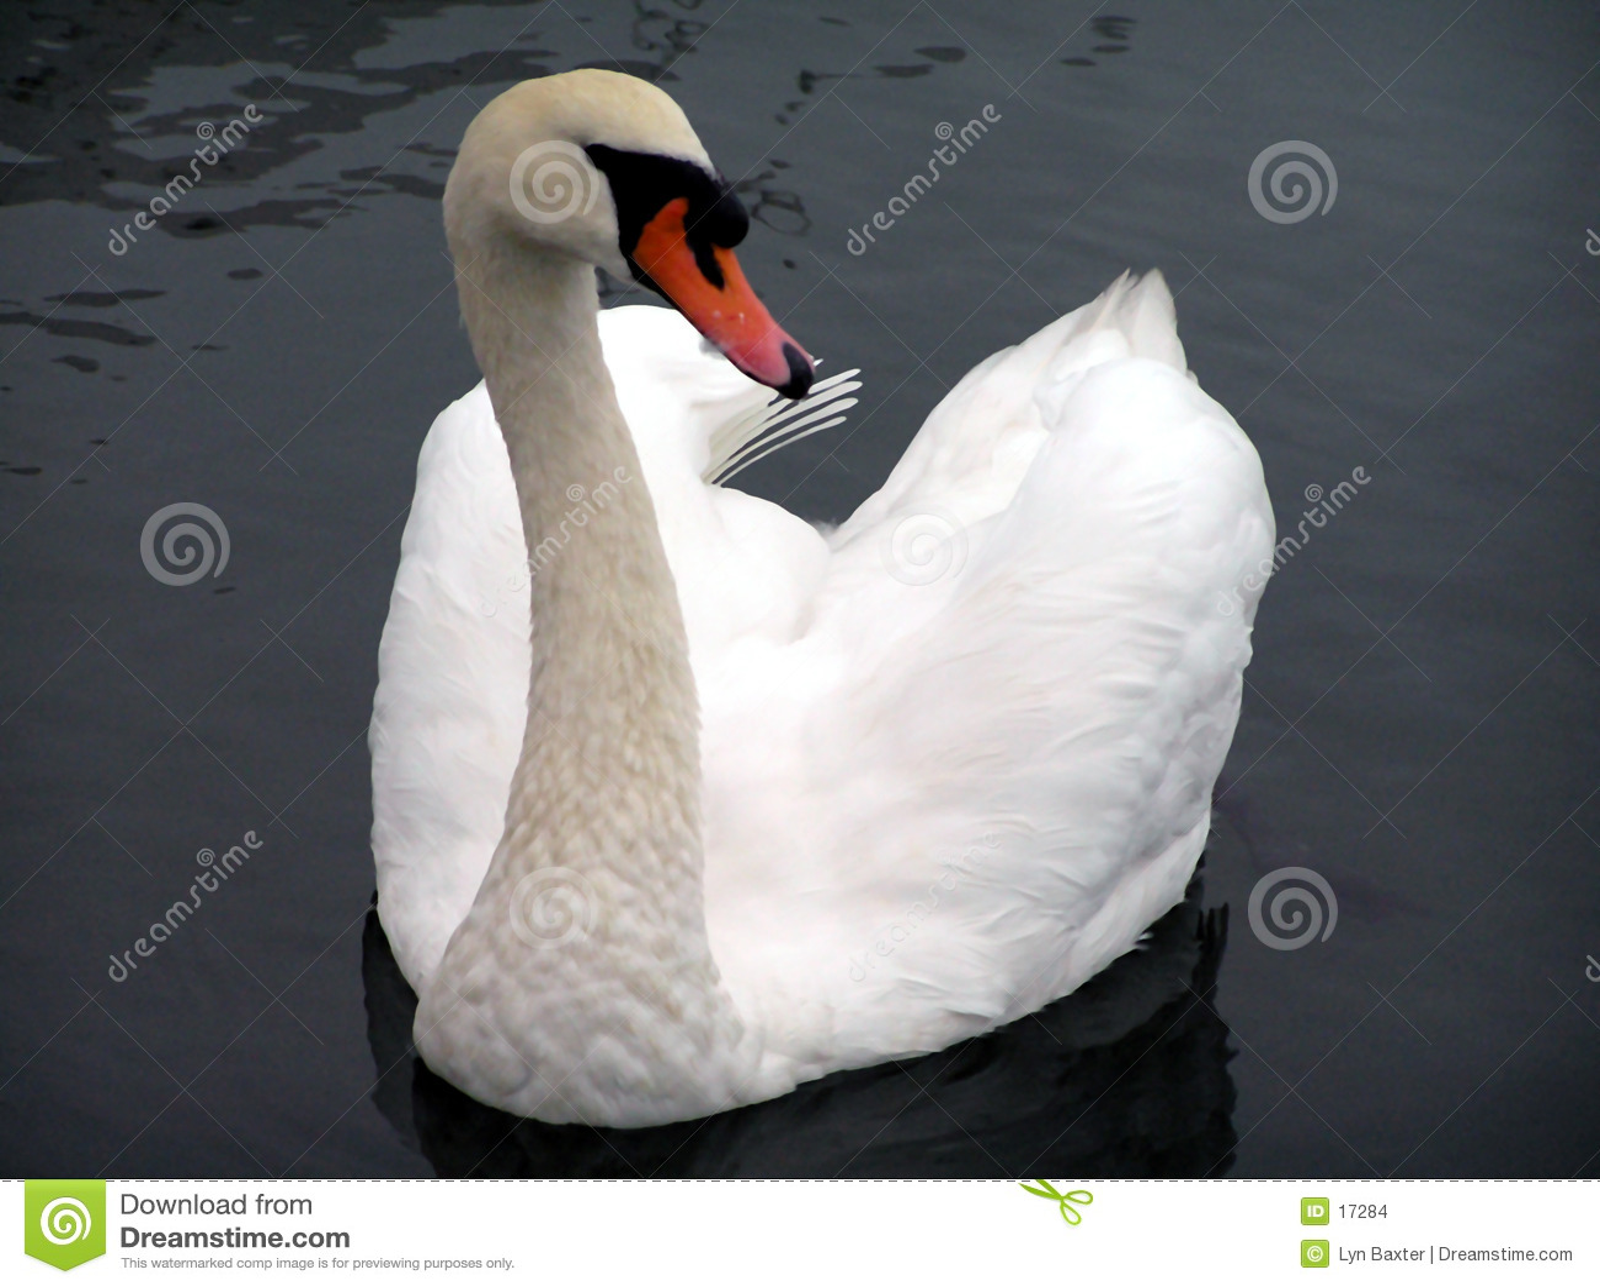 Swan of Avon